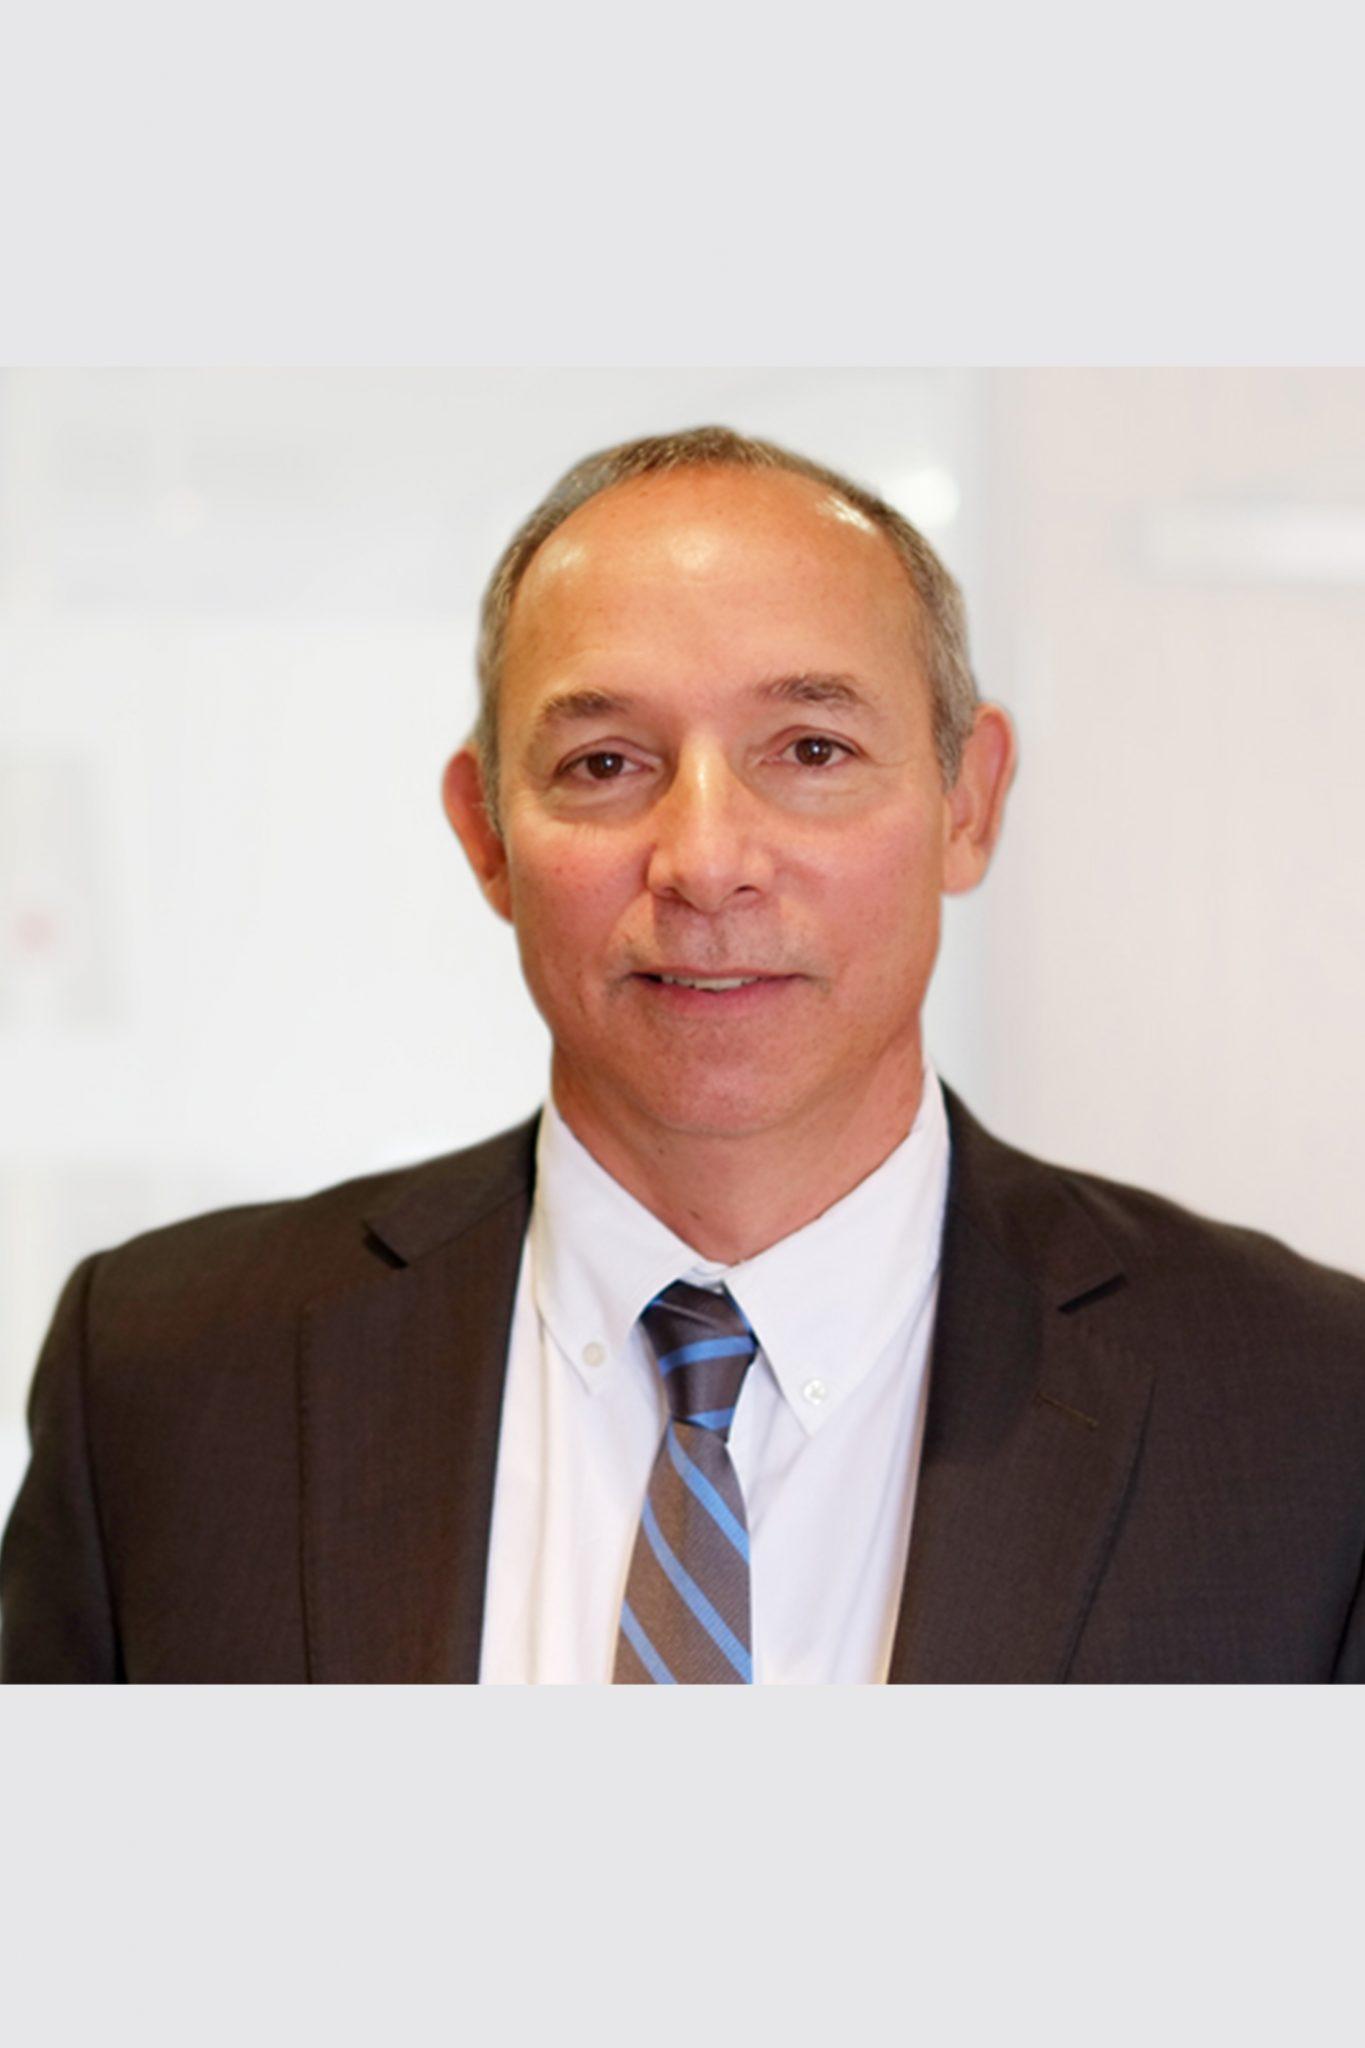 John Gransaull - Certified Business Coach at ActionEDGE